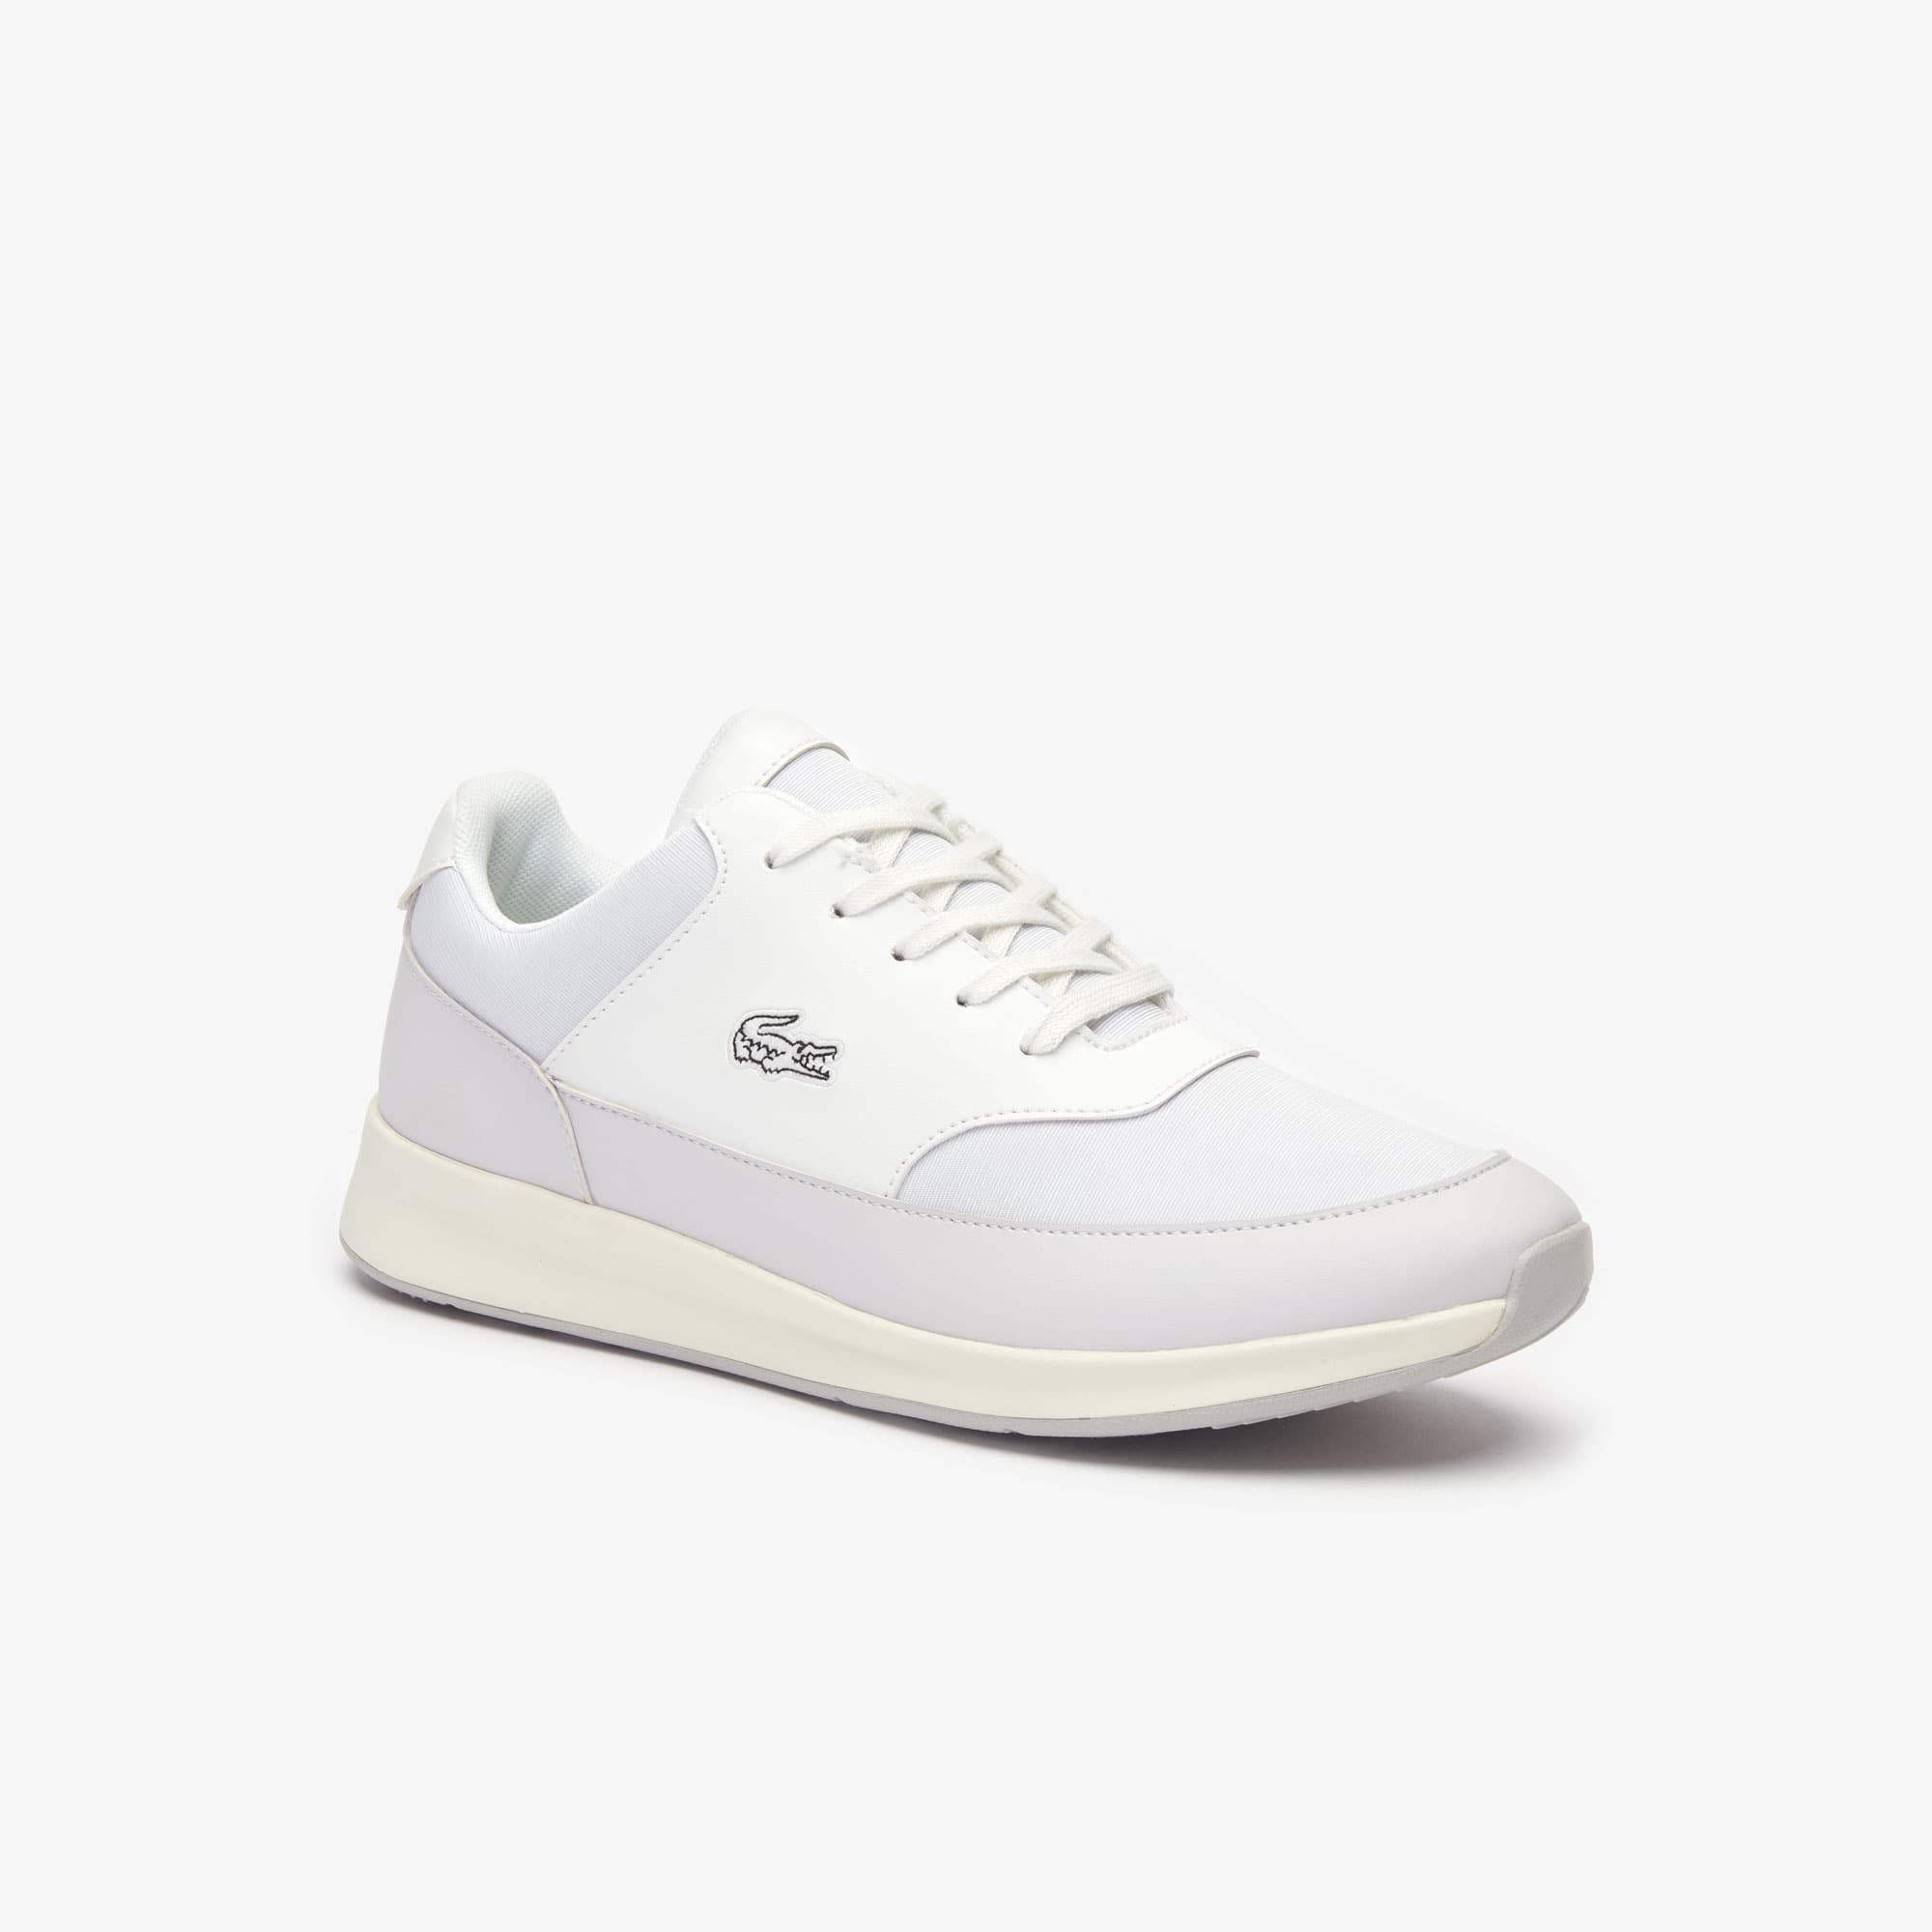 Lacoste Damen-sneakers Chaumont Aus Stoff - Off Wht/lt Gry Size 39